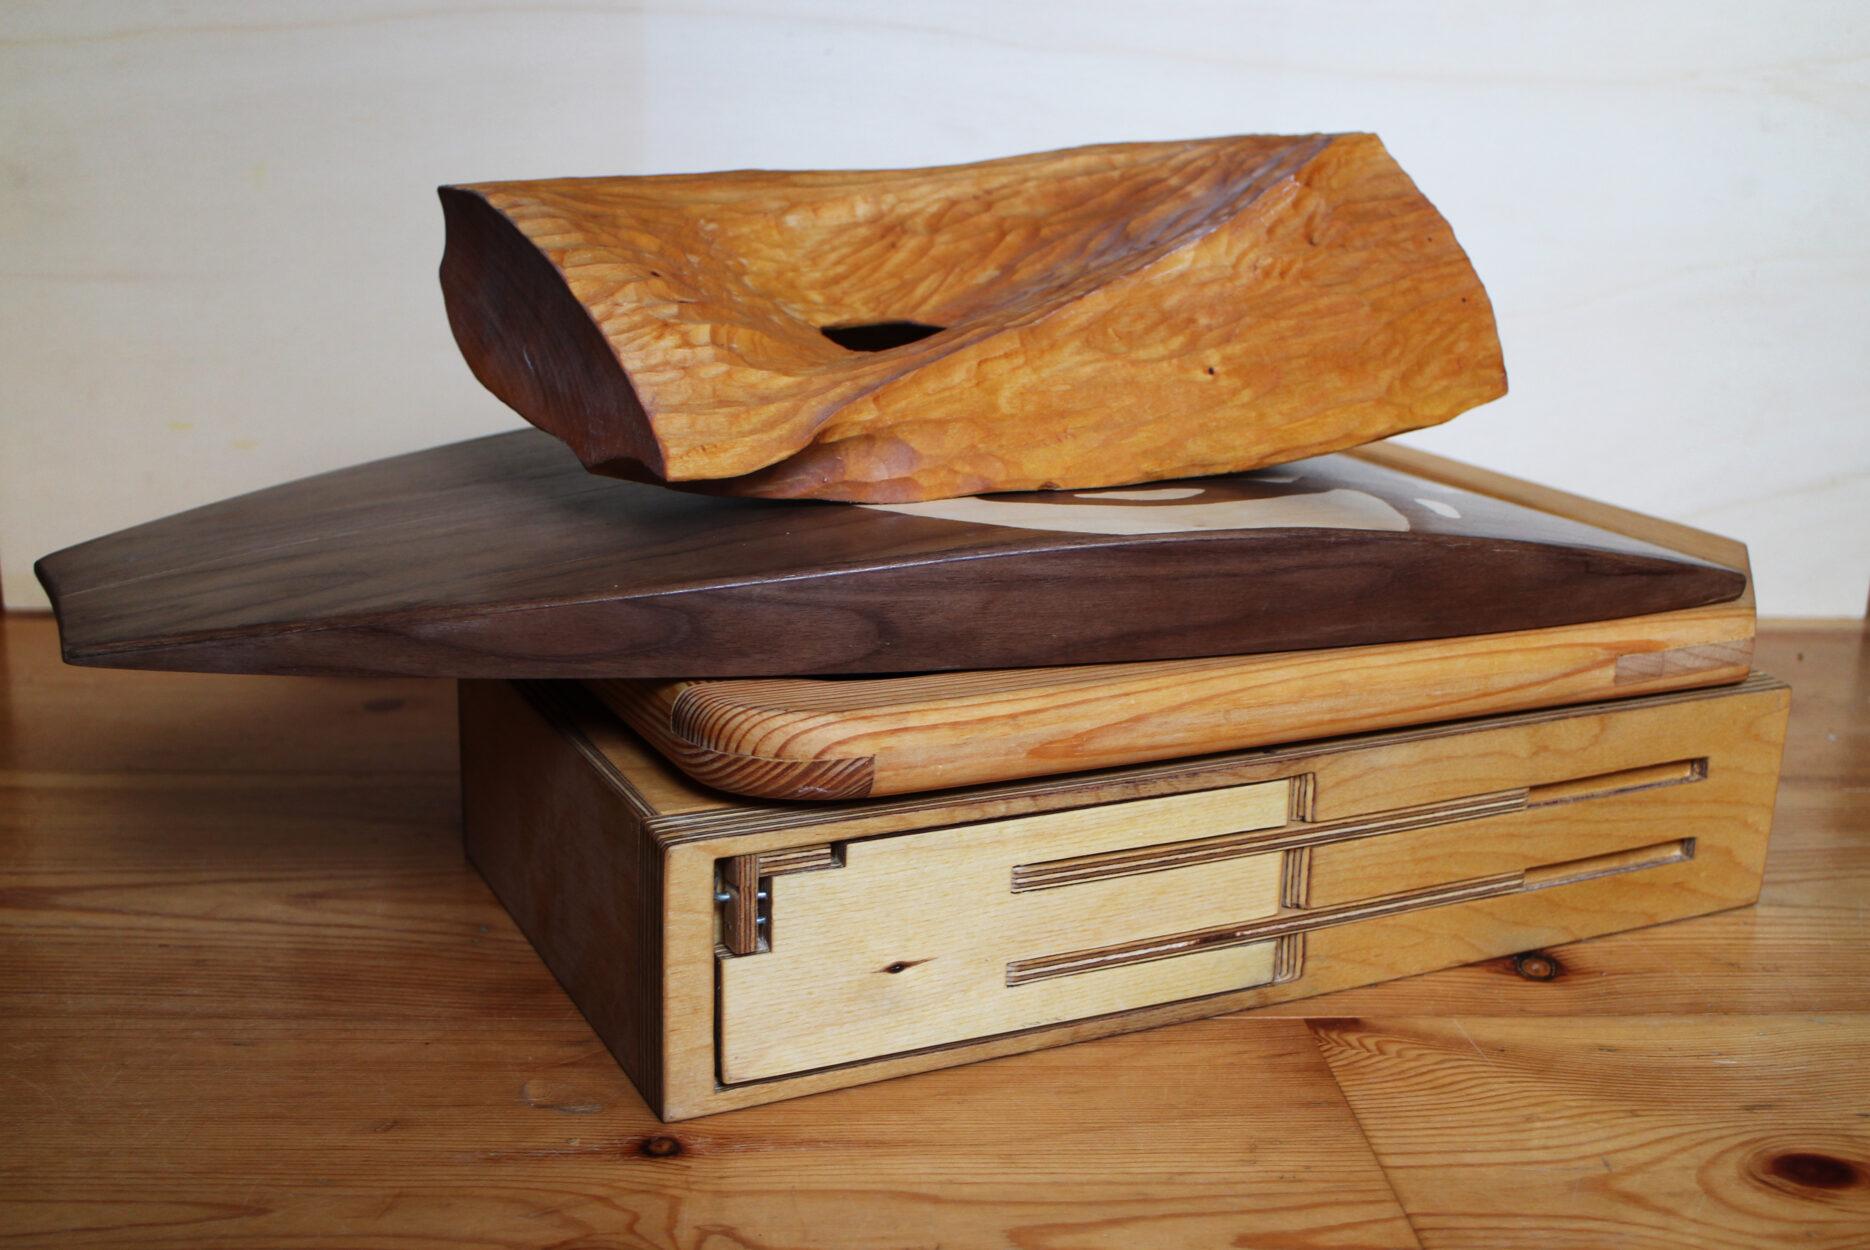 gestapelte Holzarbeiten